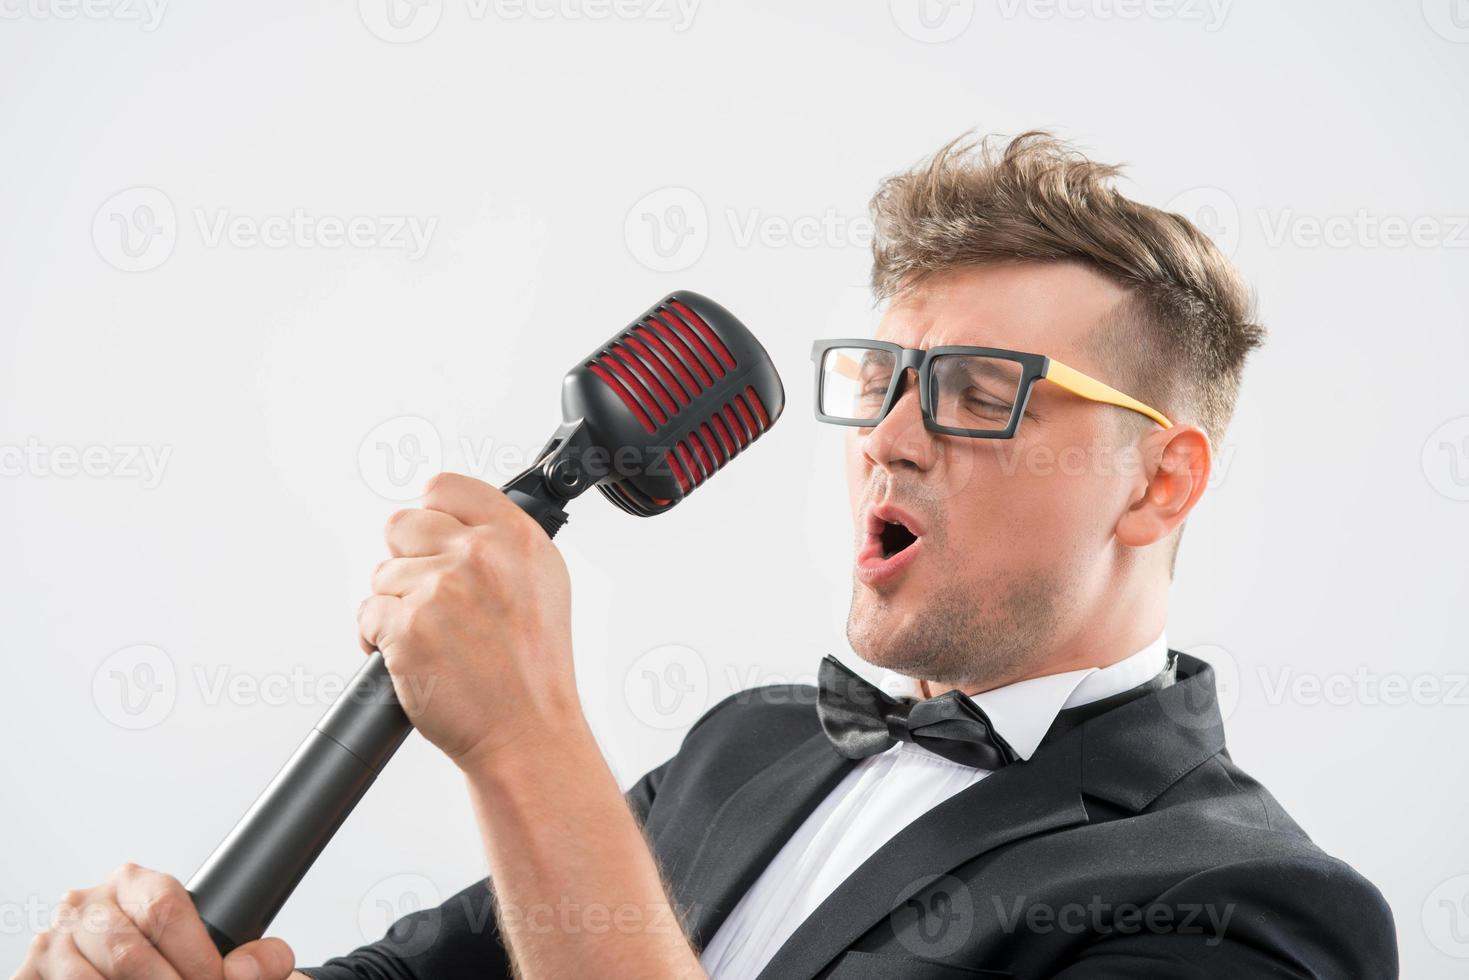 Mc singing in microphone photo